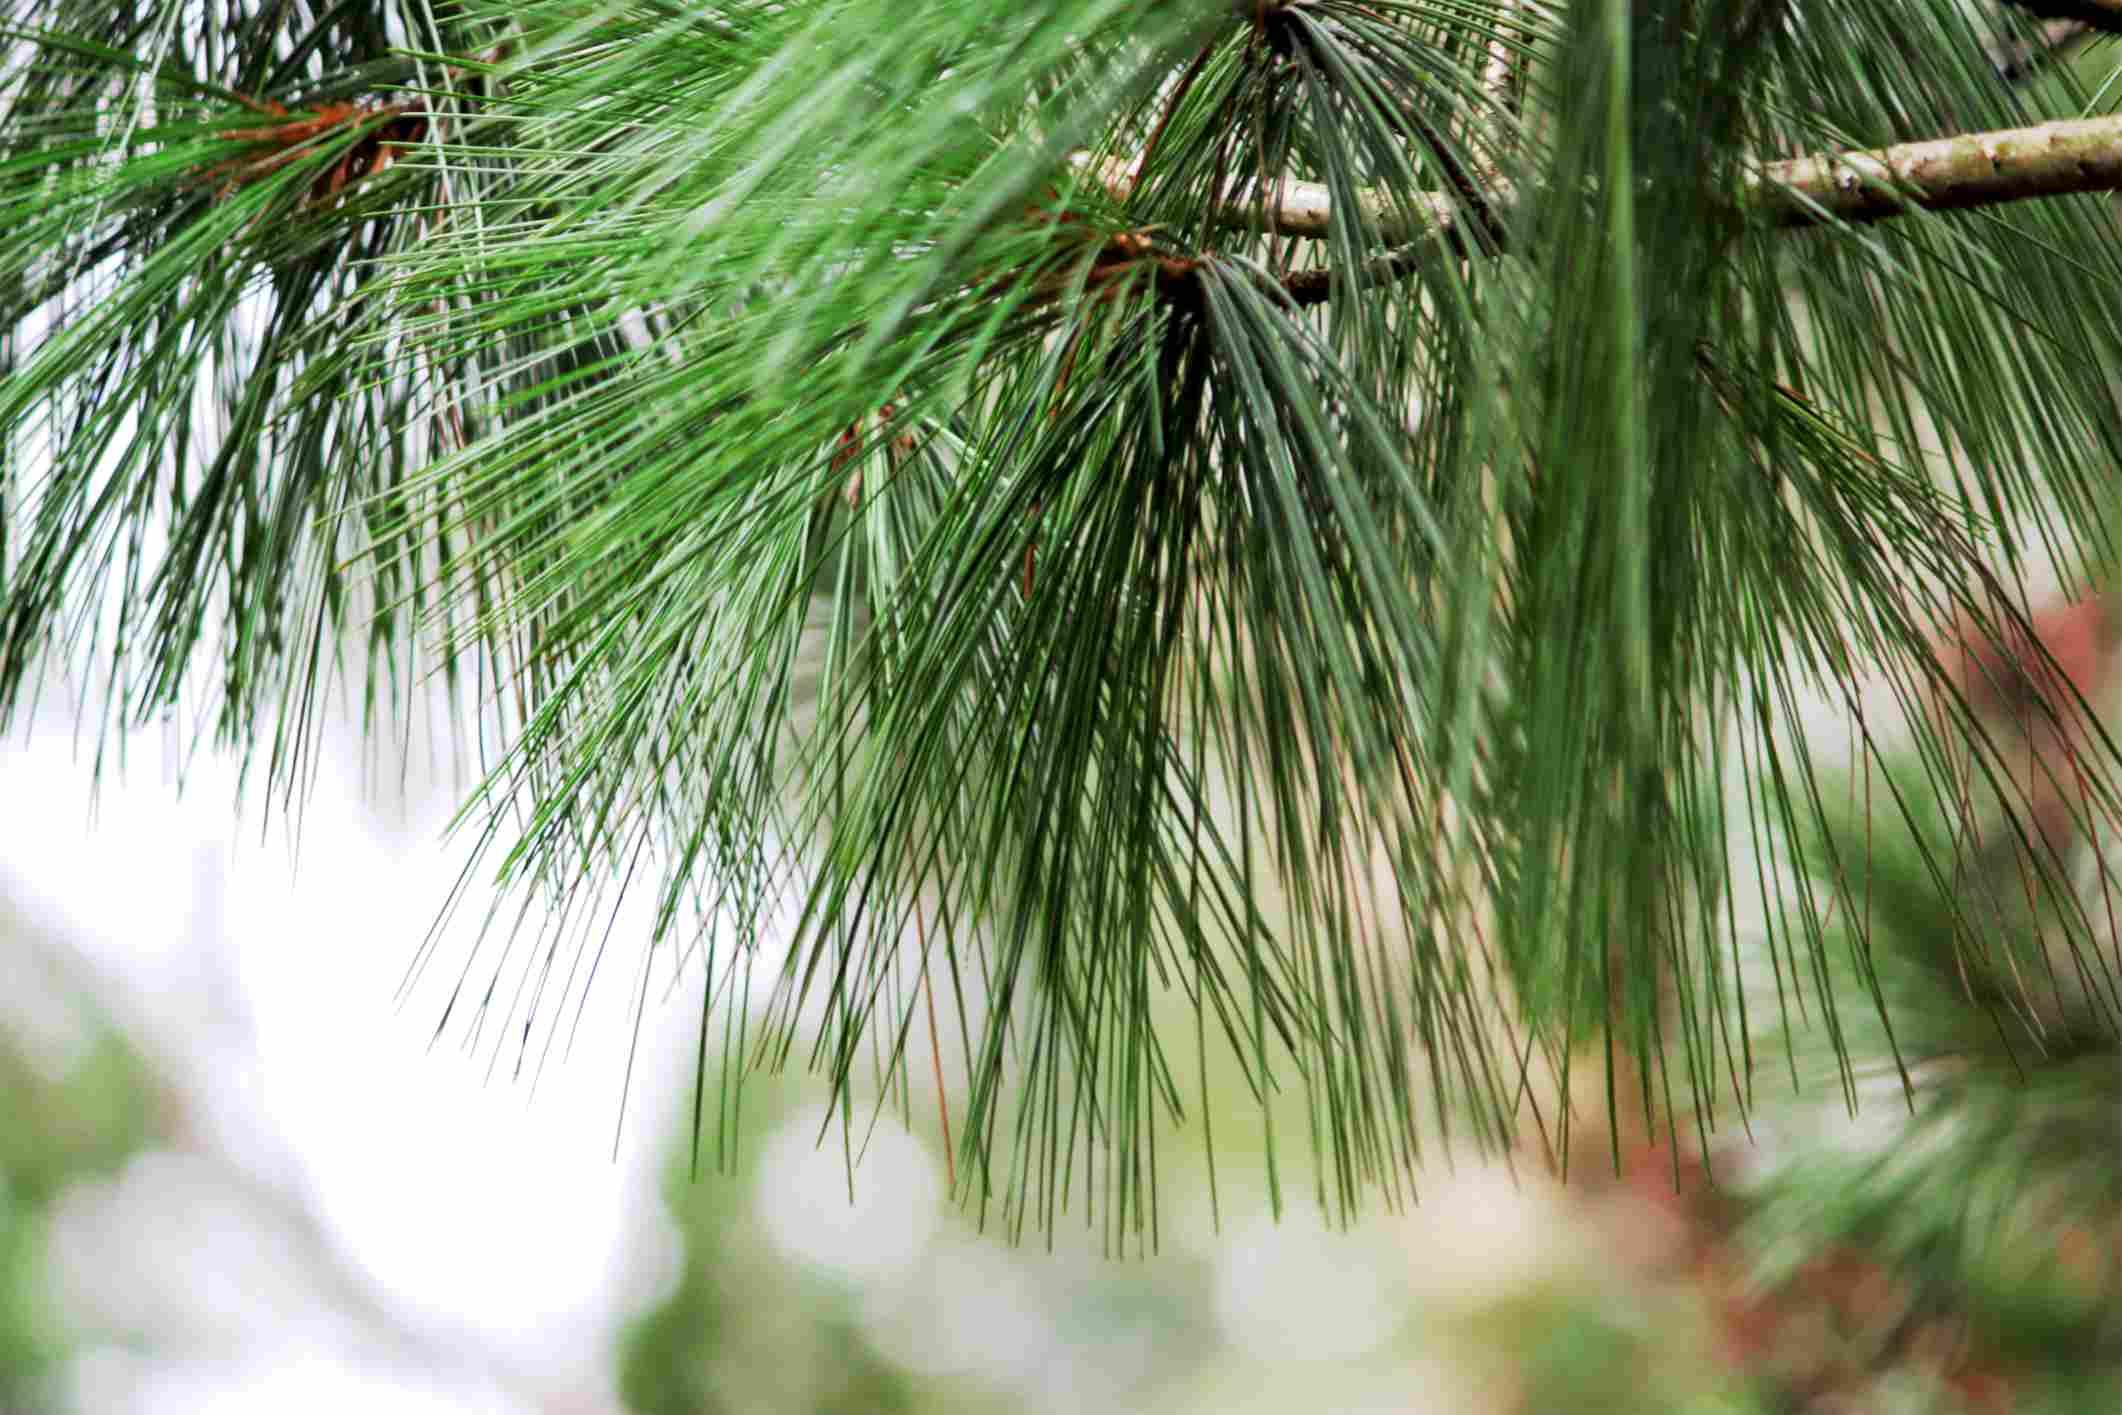 closeup of pine needles